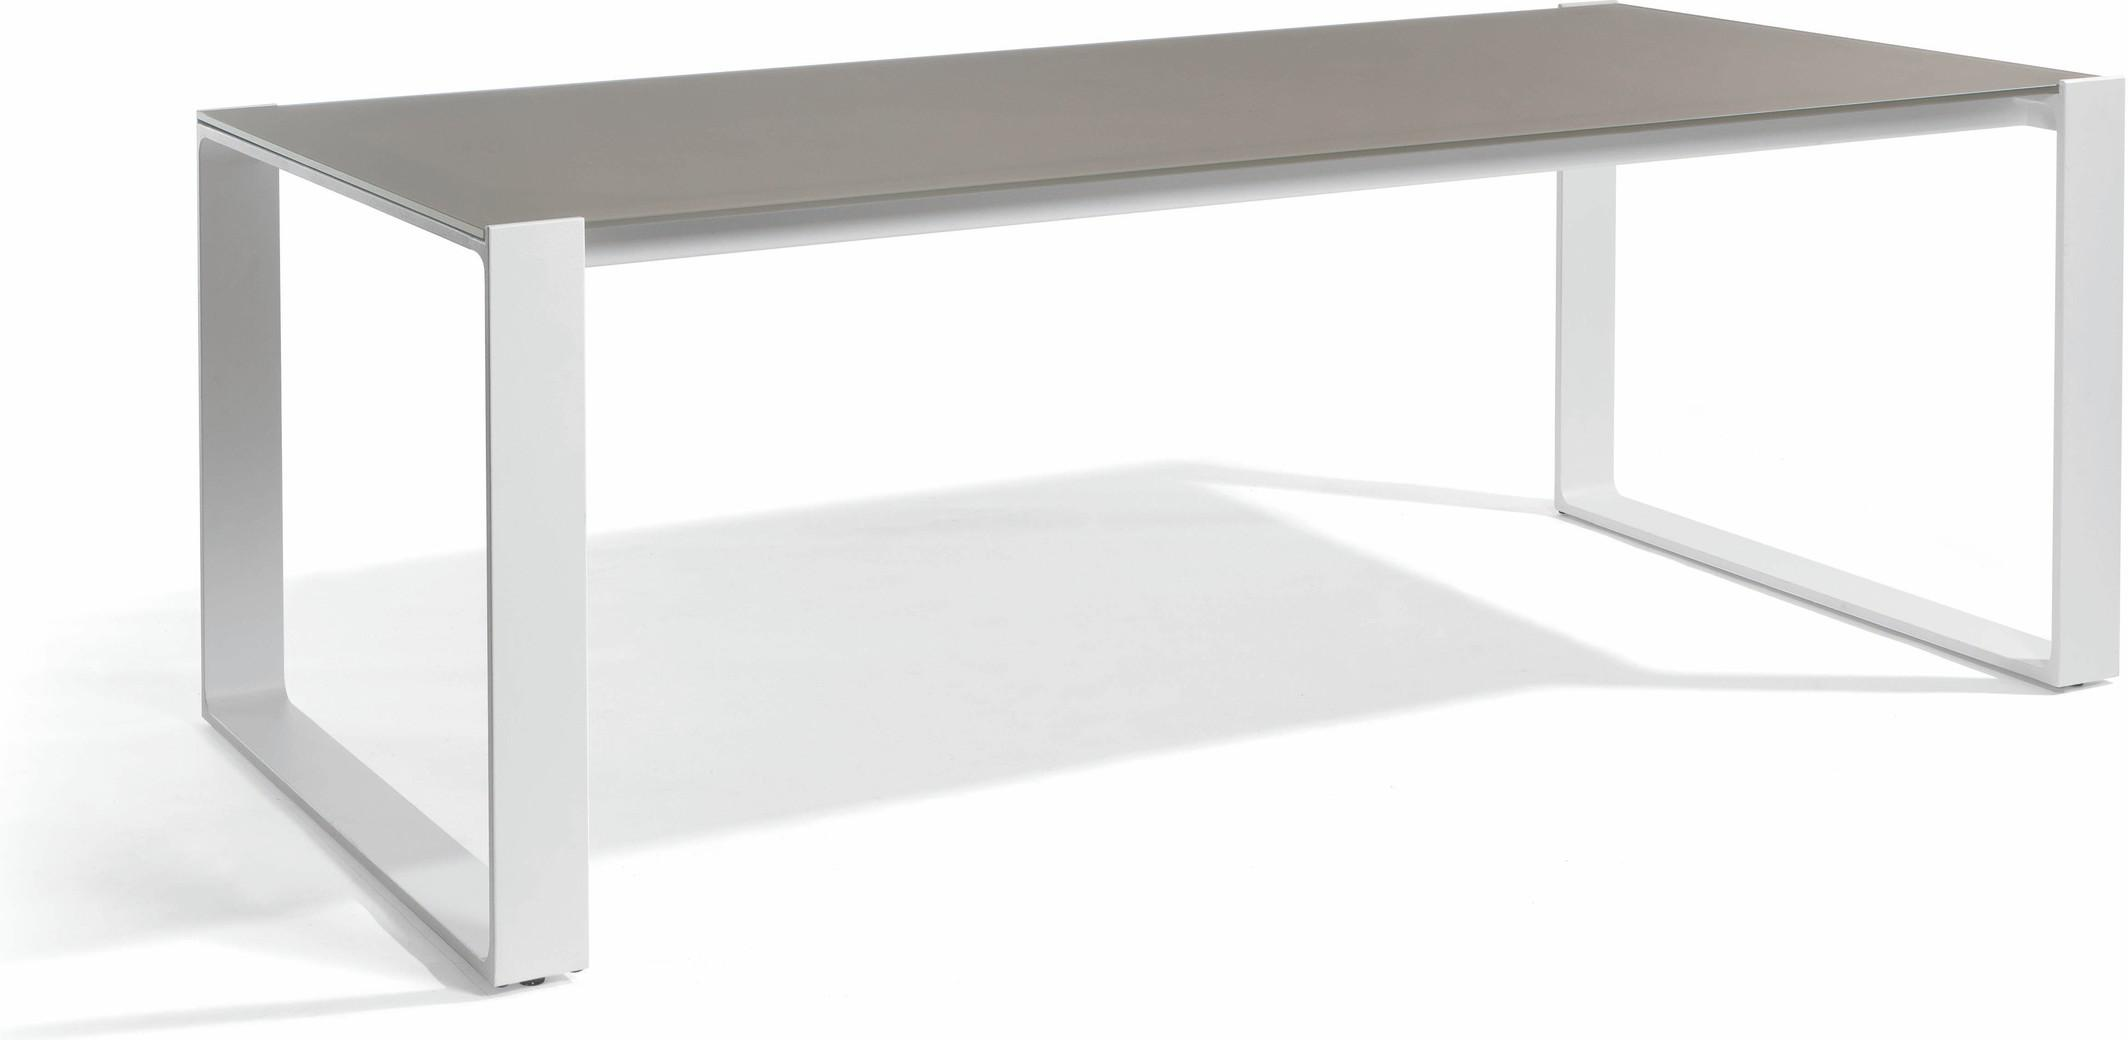 Table à manger Prato - blanc - verre taupe 215